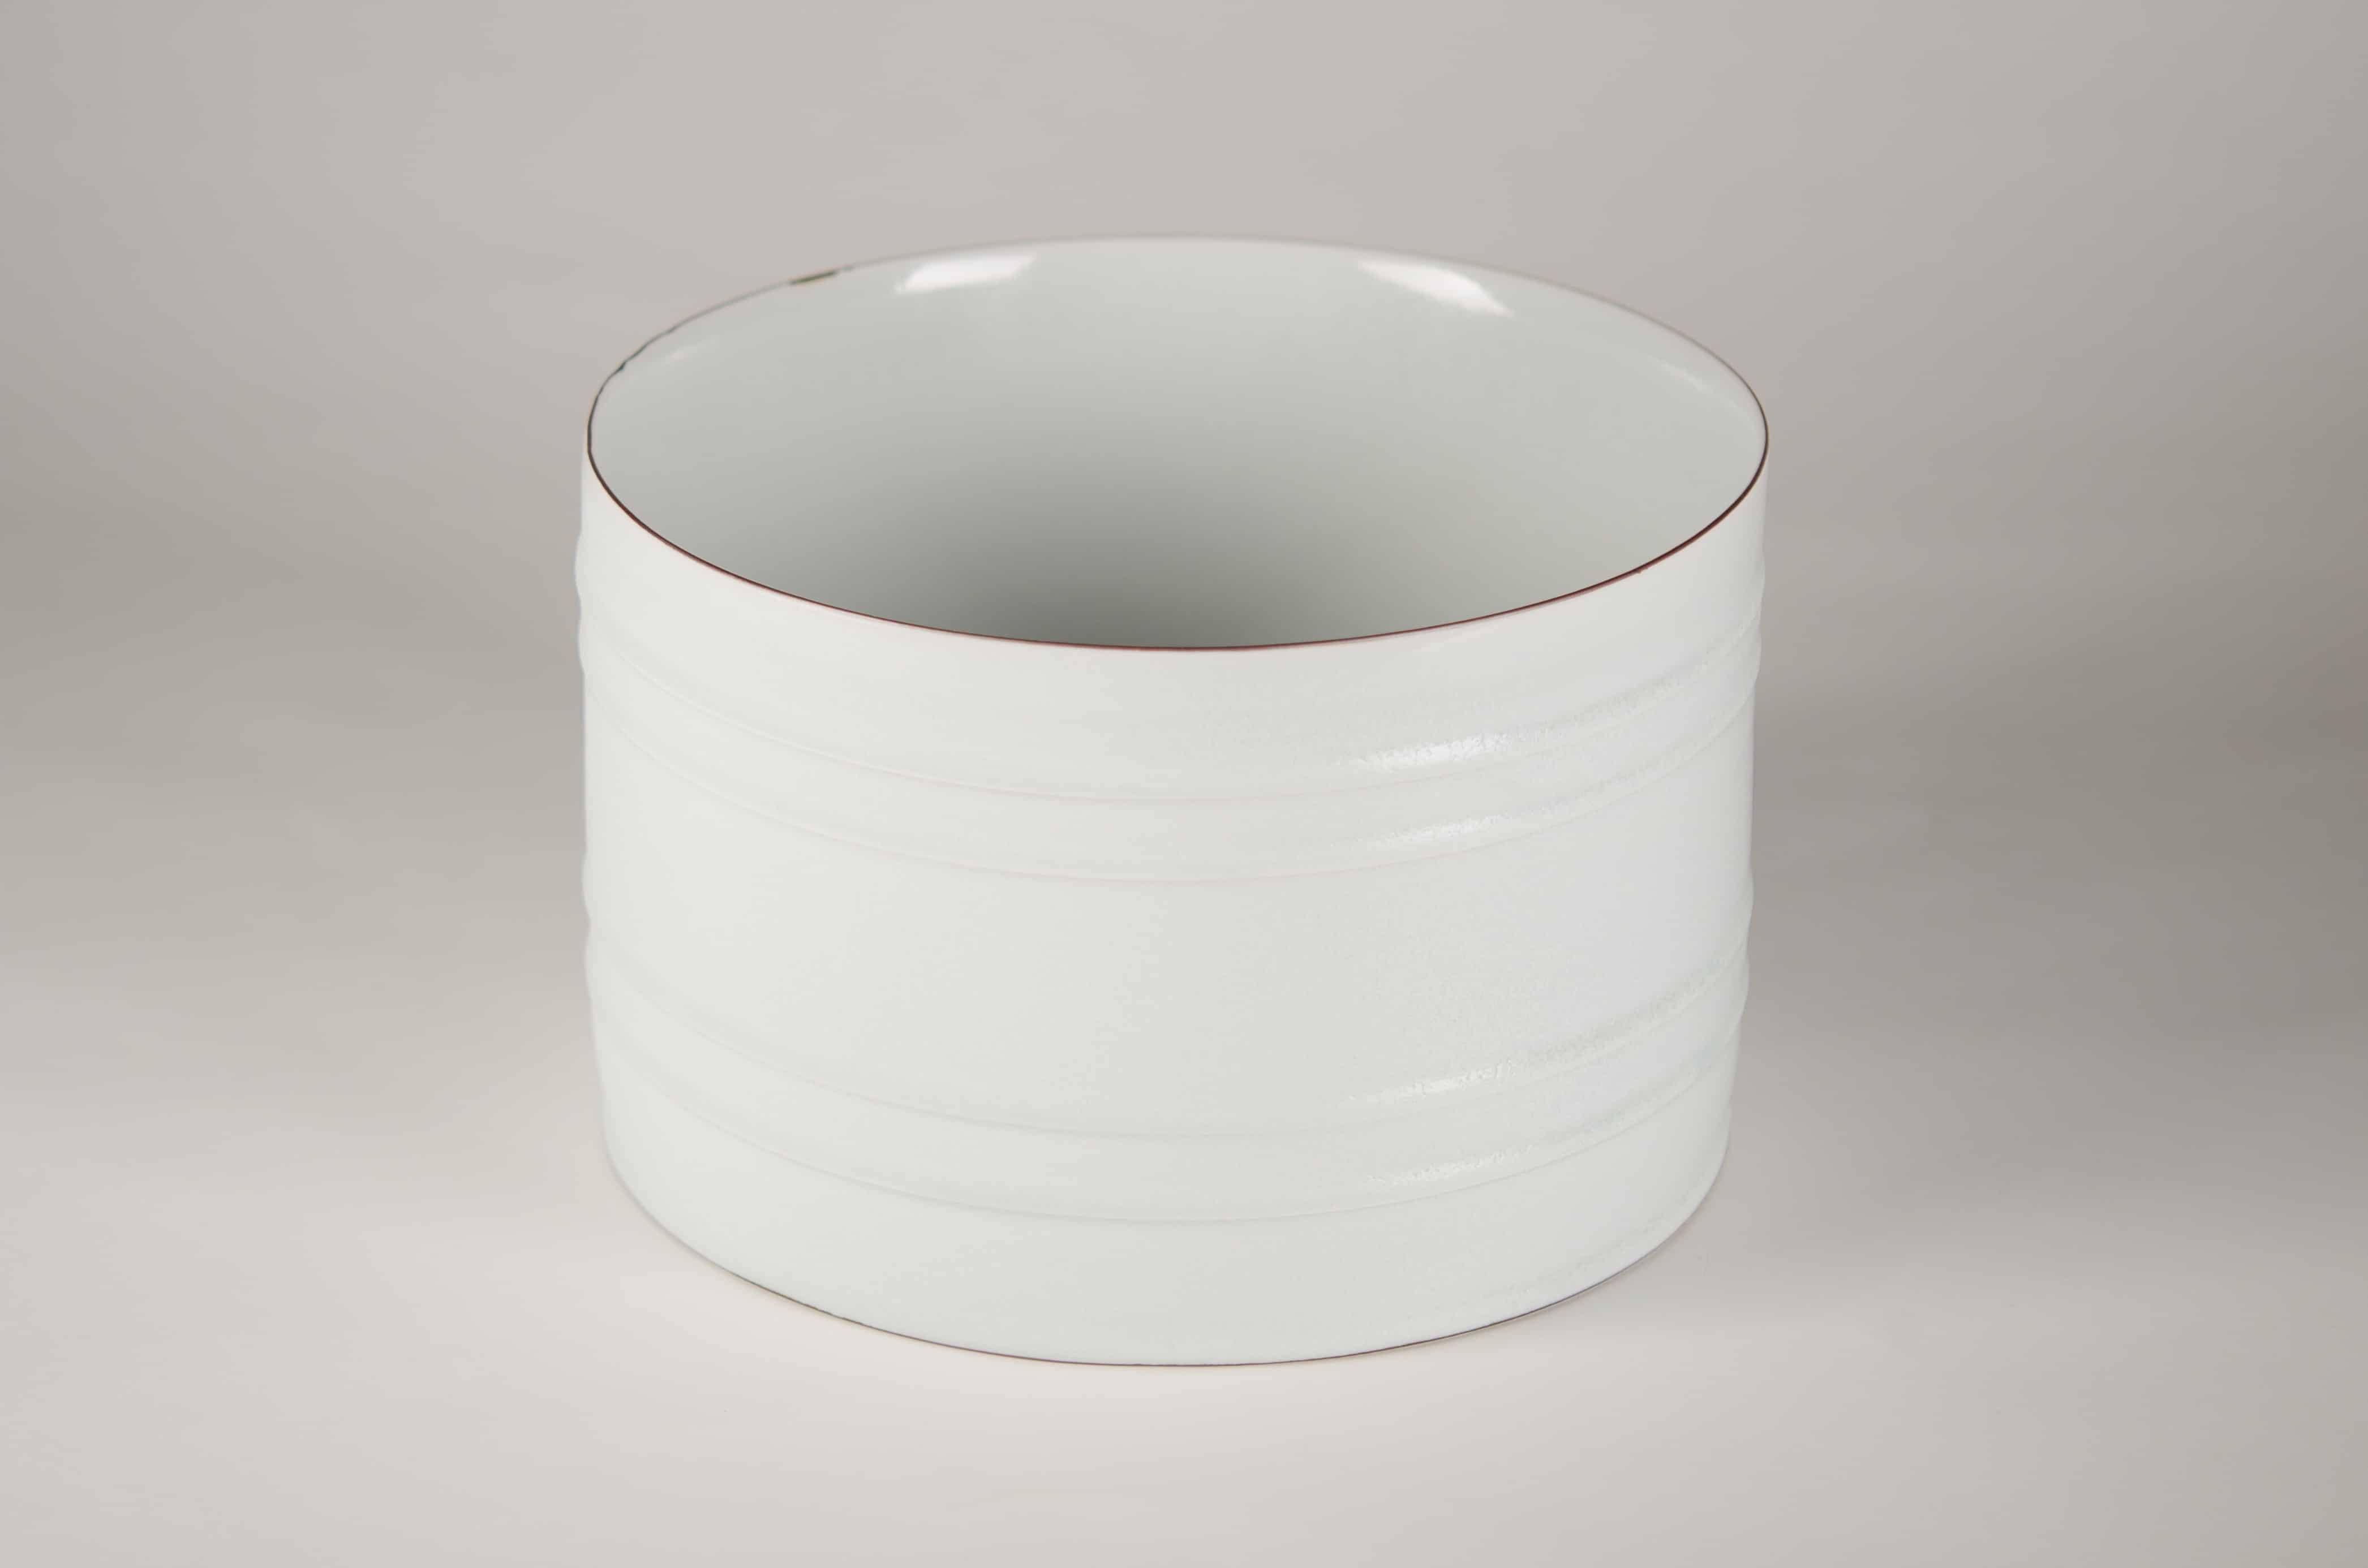 Kirsten Coelho, Large bowl, porcelain matt white/pale blue sheen glaze. banded iron oxide, approx. 17cm H x 27cm diam, 2015